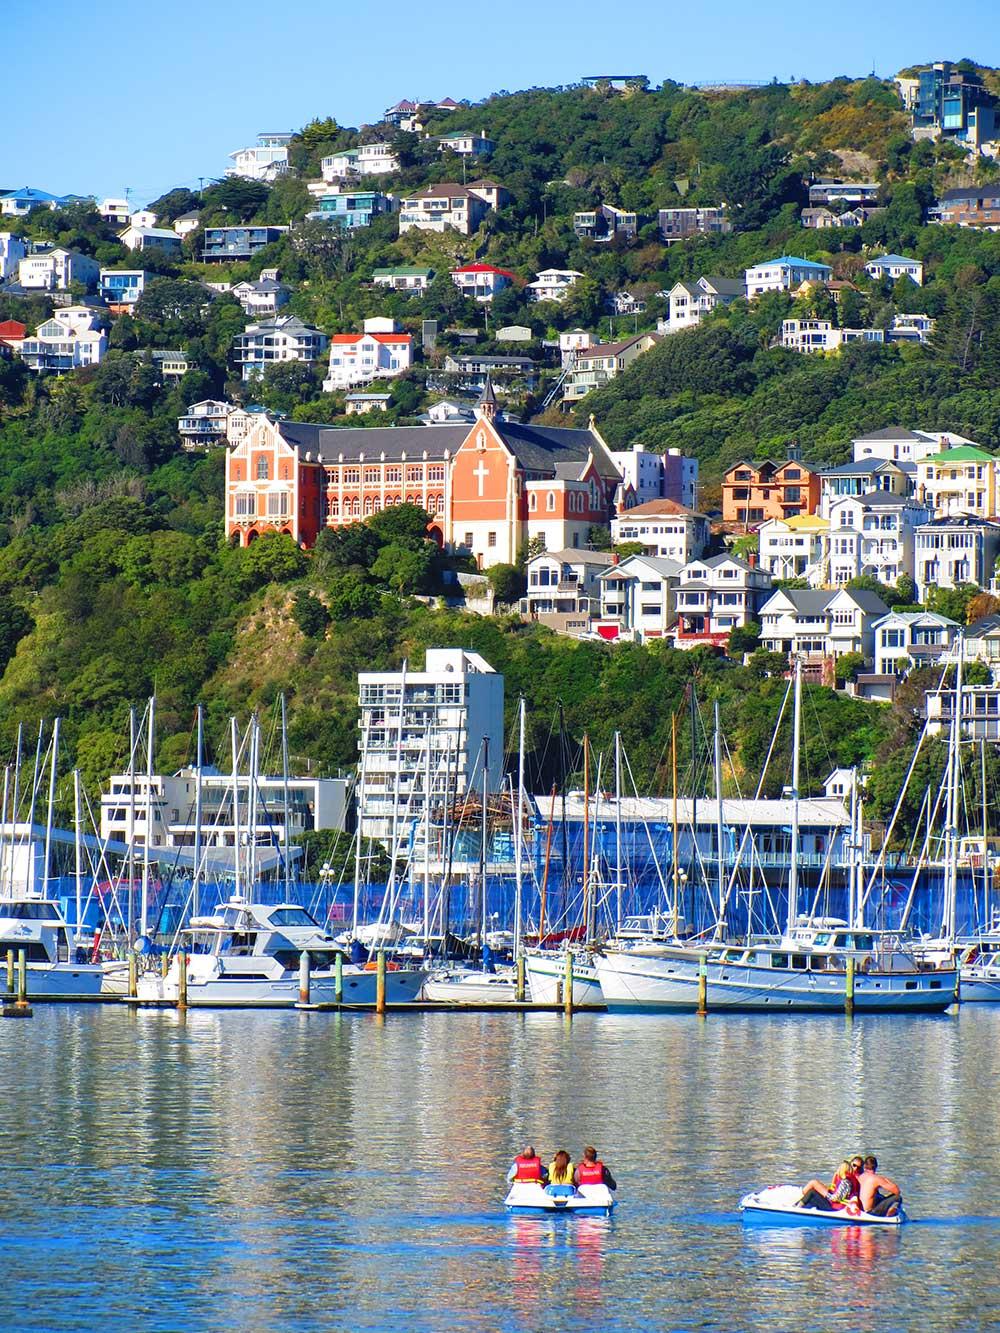 People-on-Pedalo-Boats-in-Wellington-harbour---1000.jpg